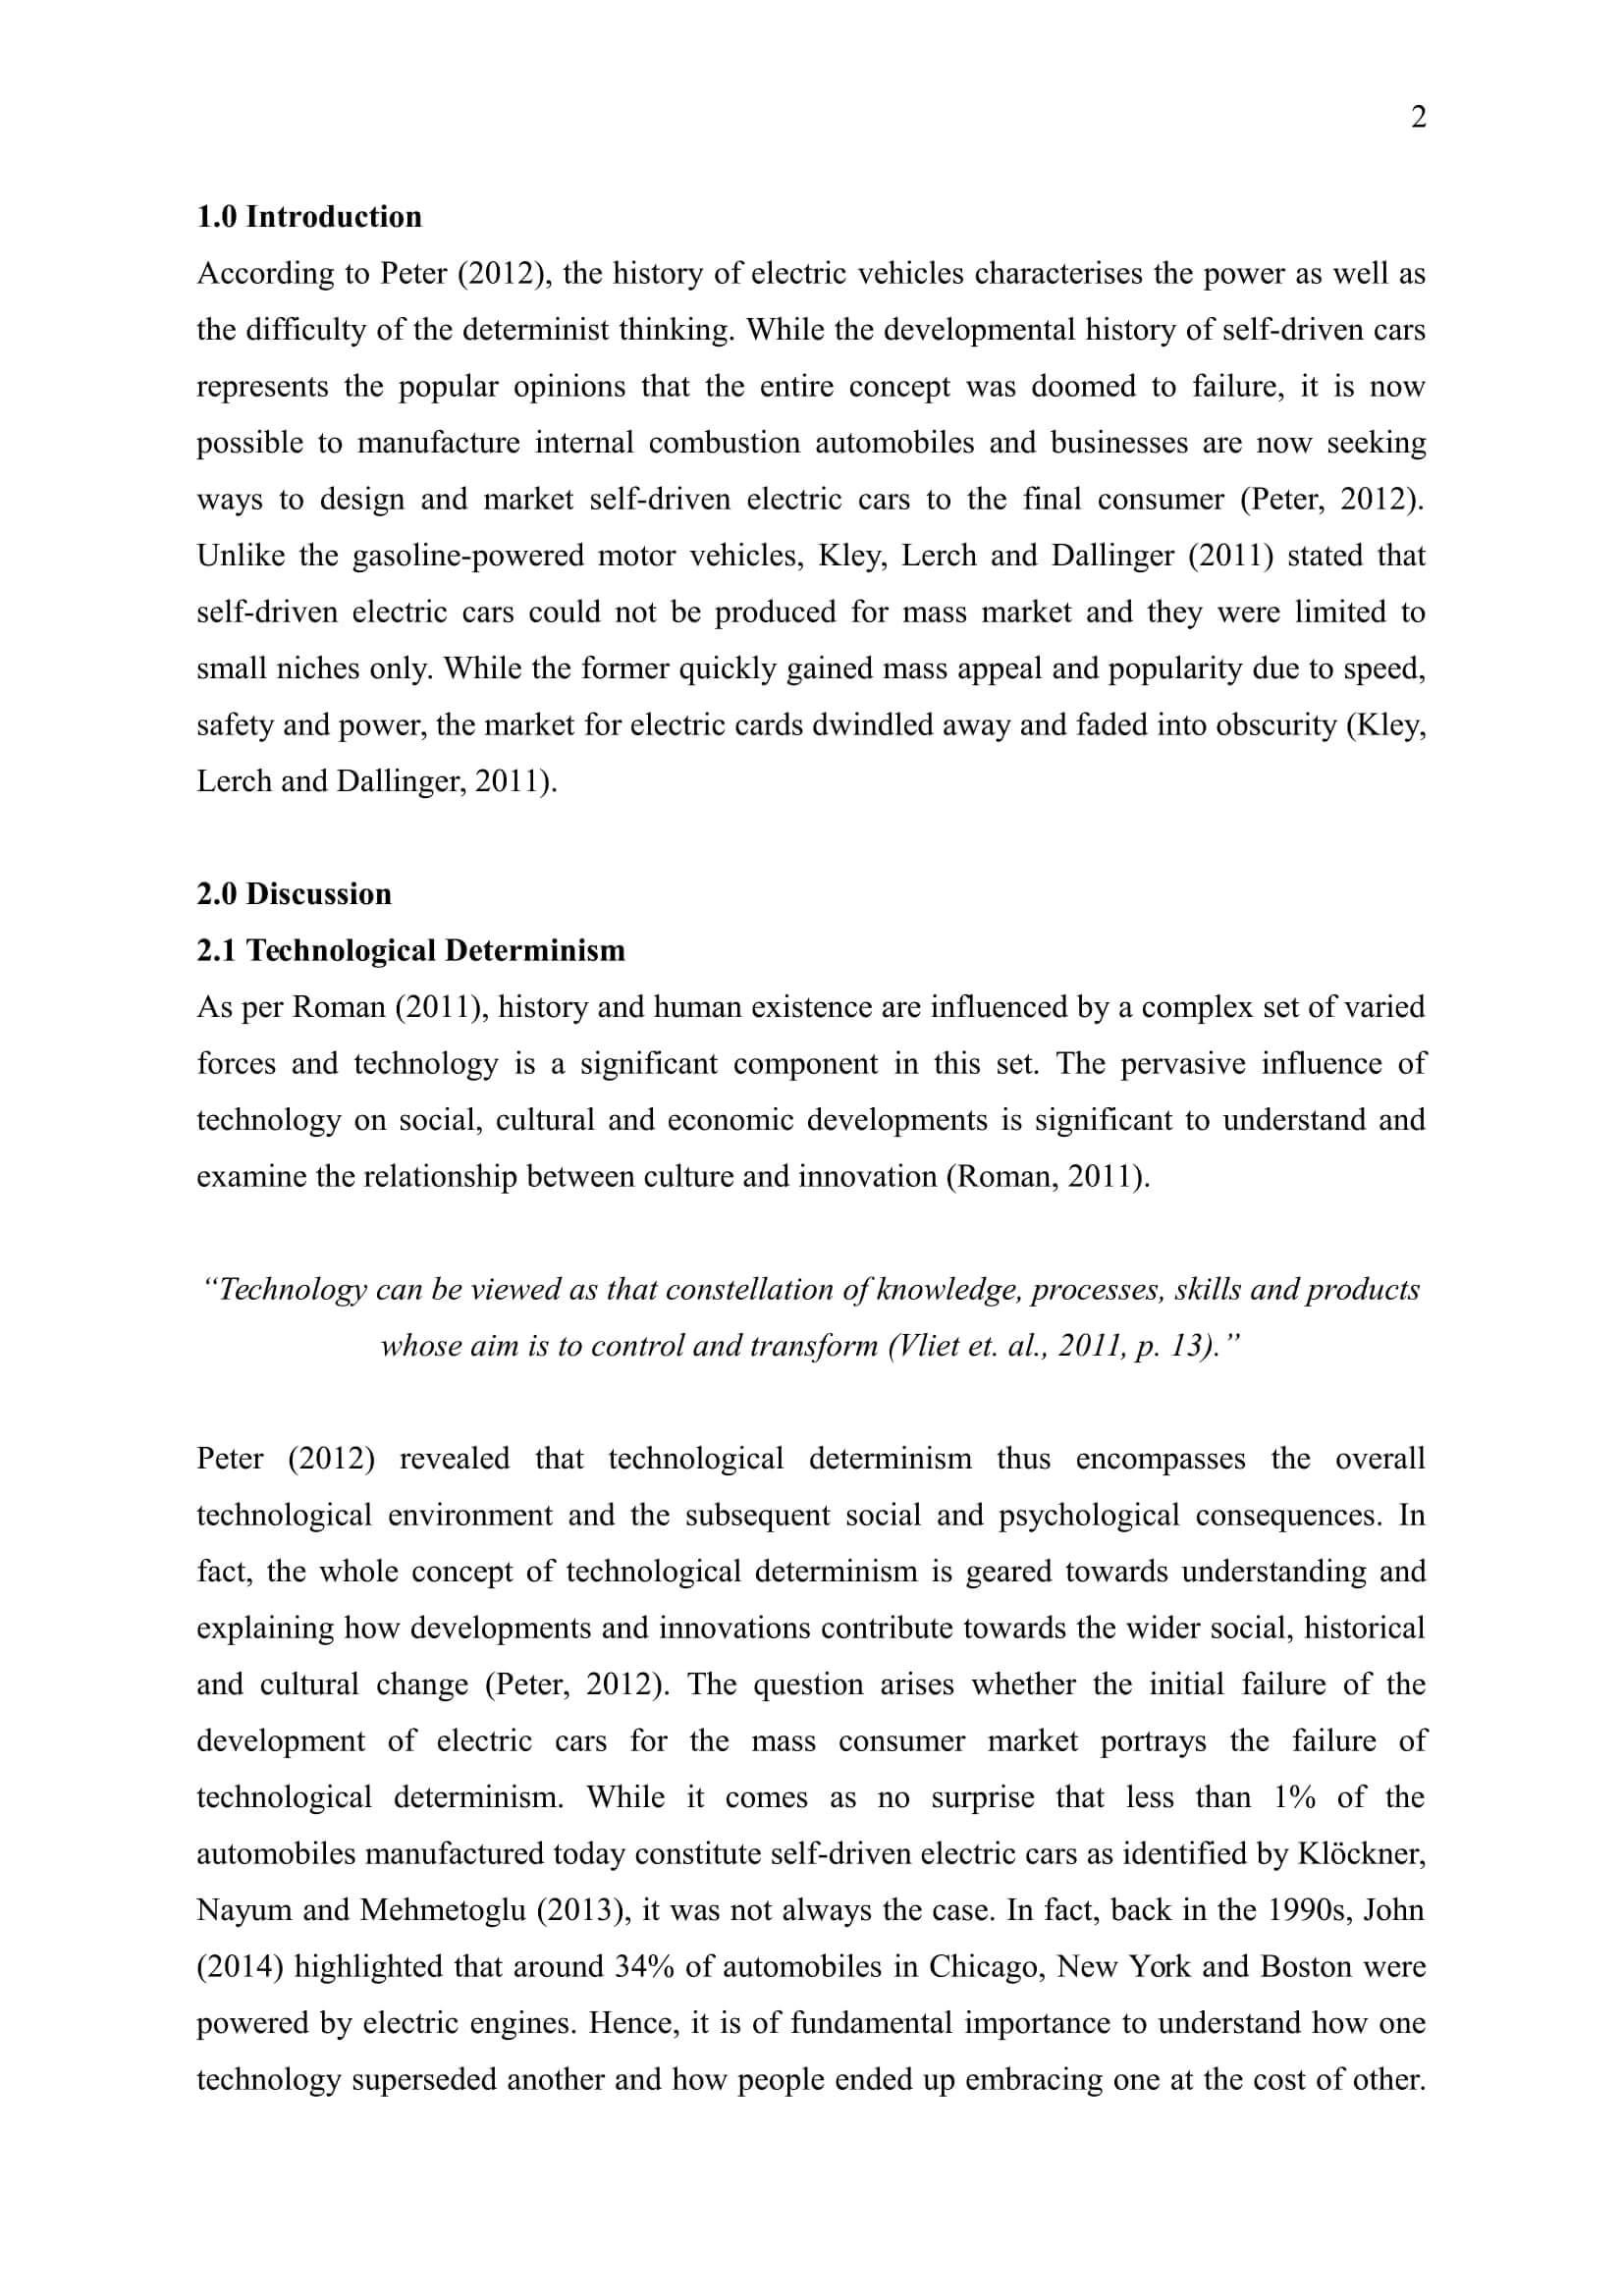 Essay on corruption in society